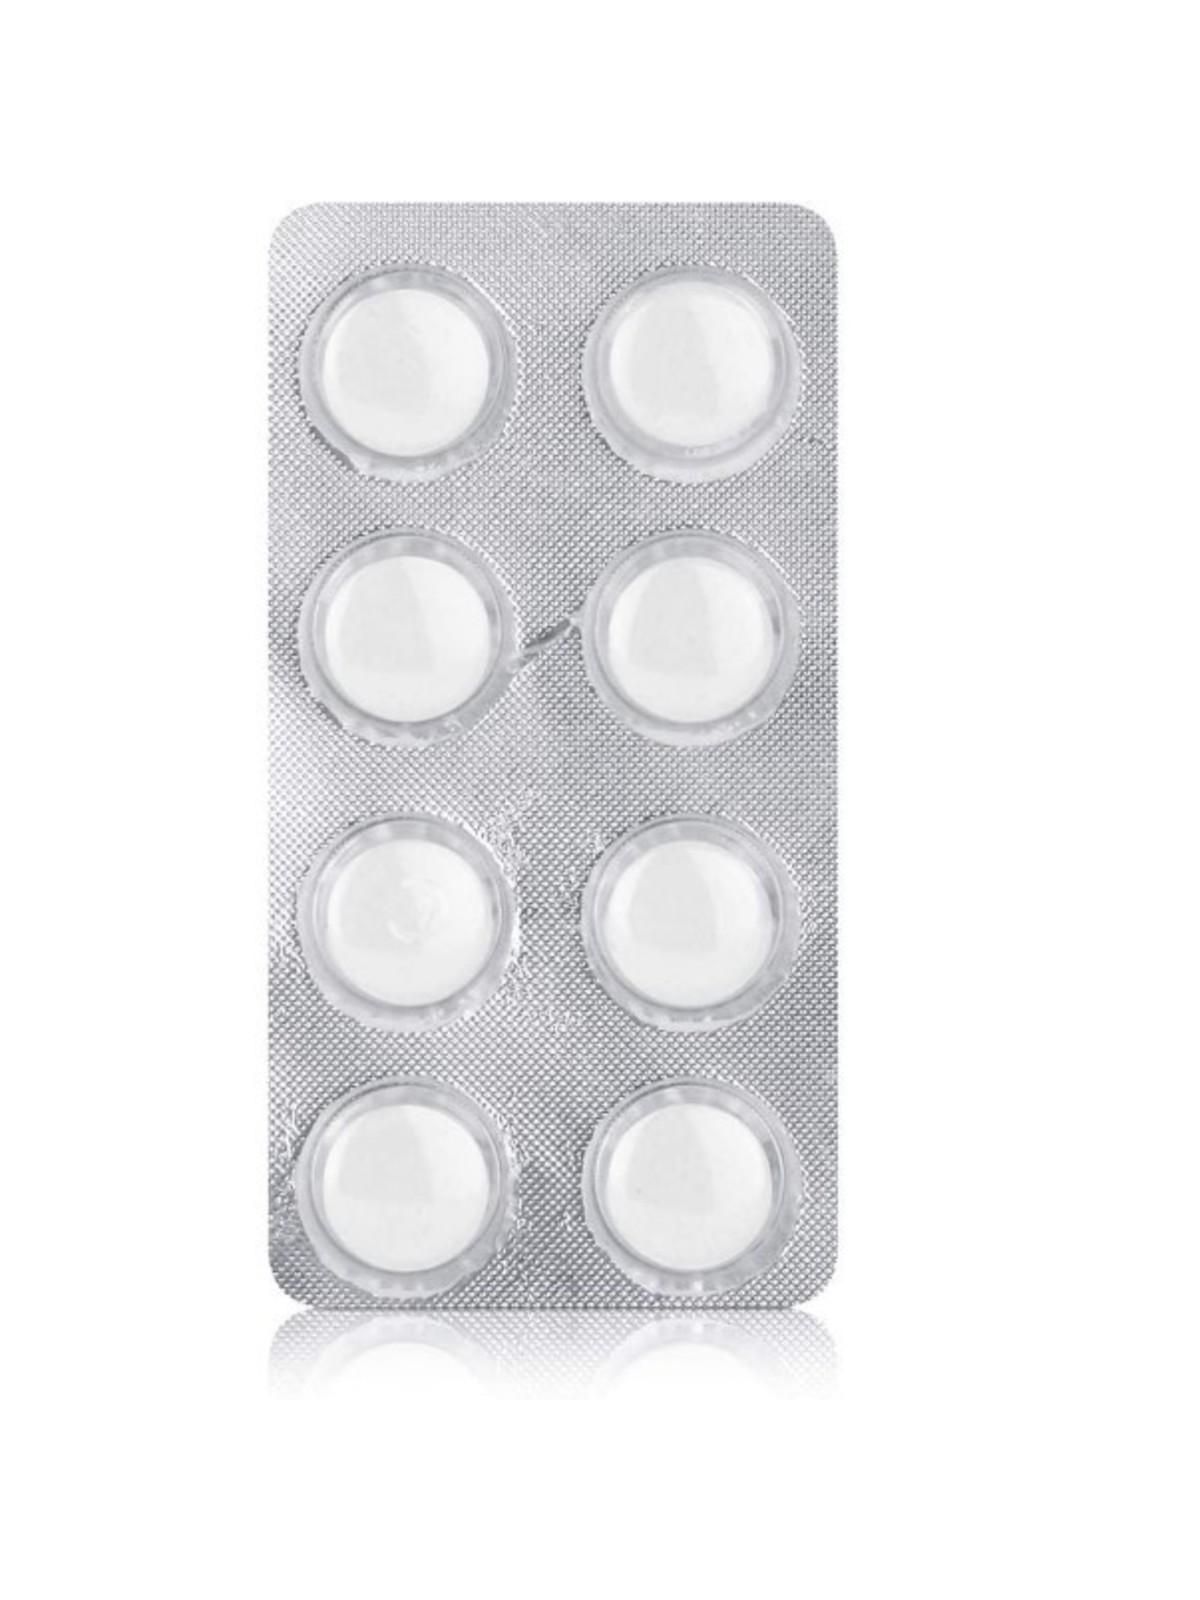 SAGE Espresso Cleaning Tablets - 8 pcs